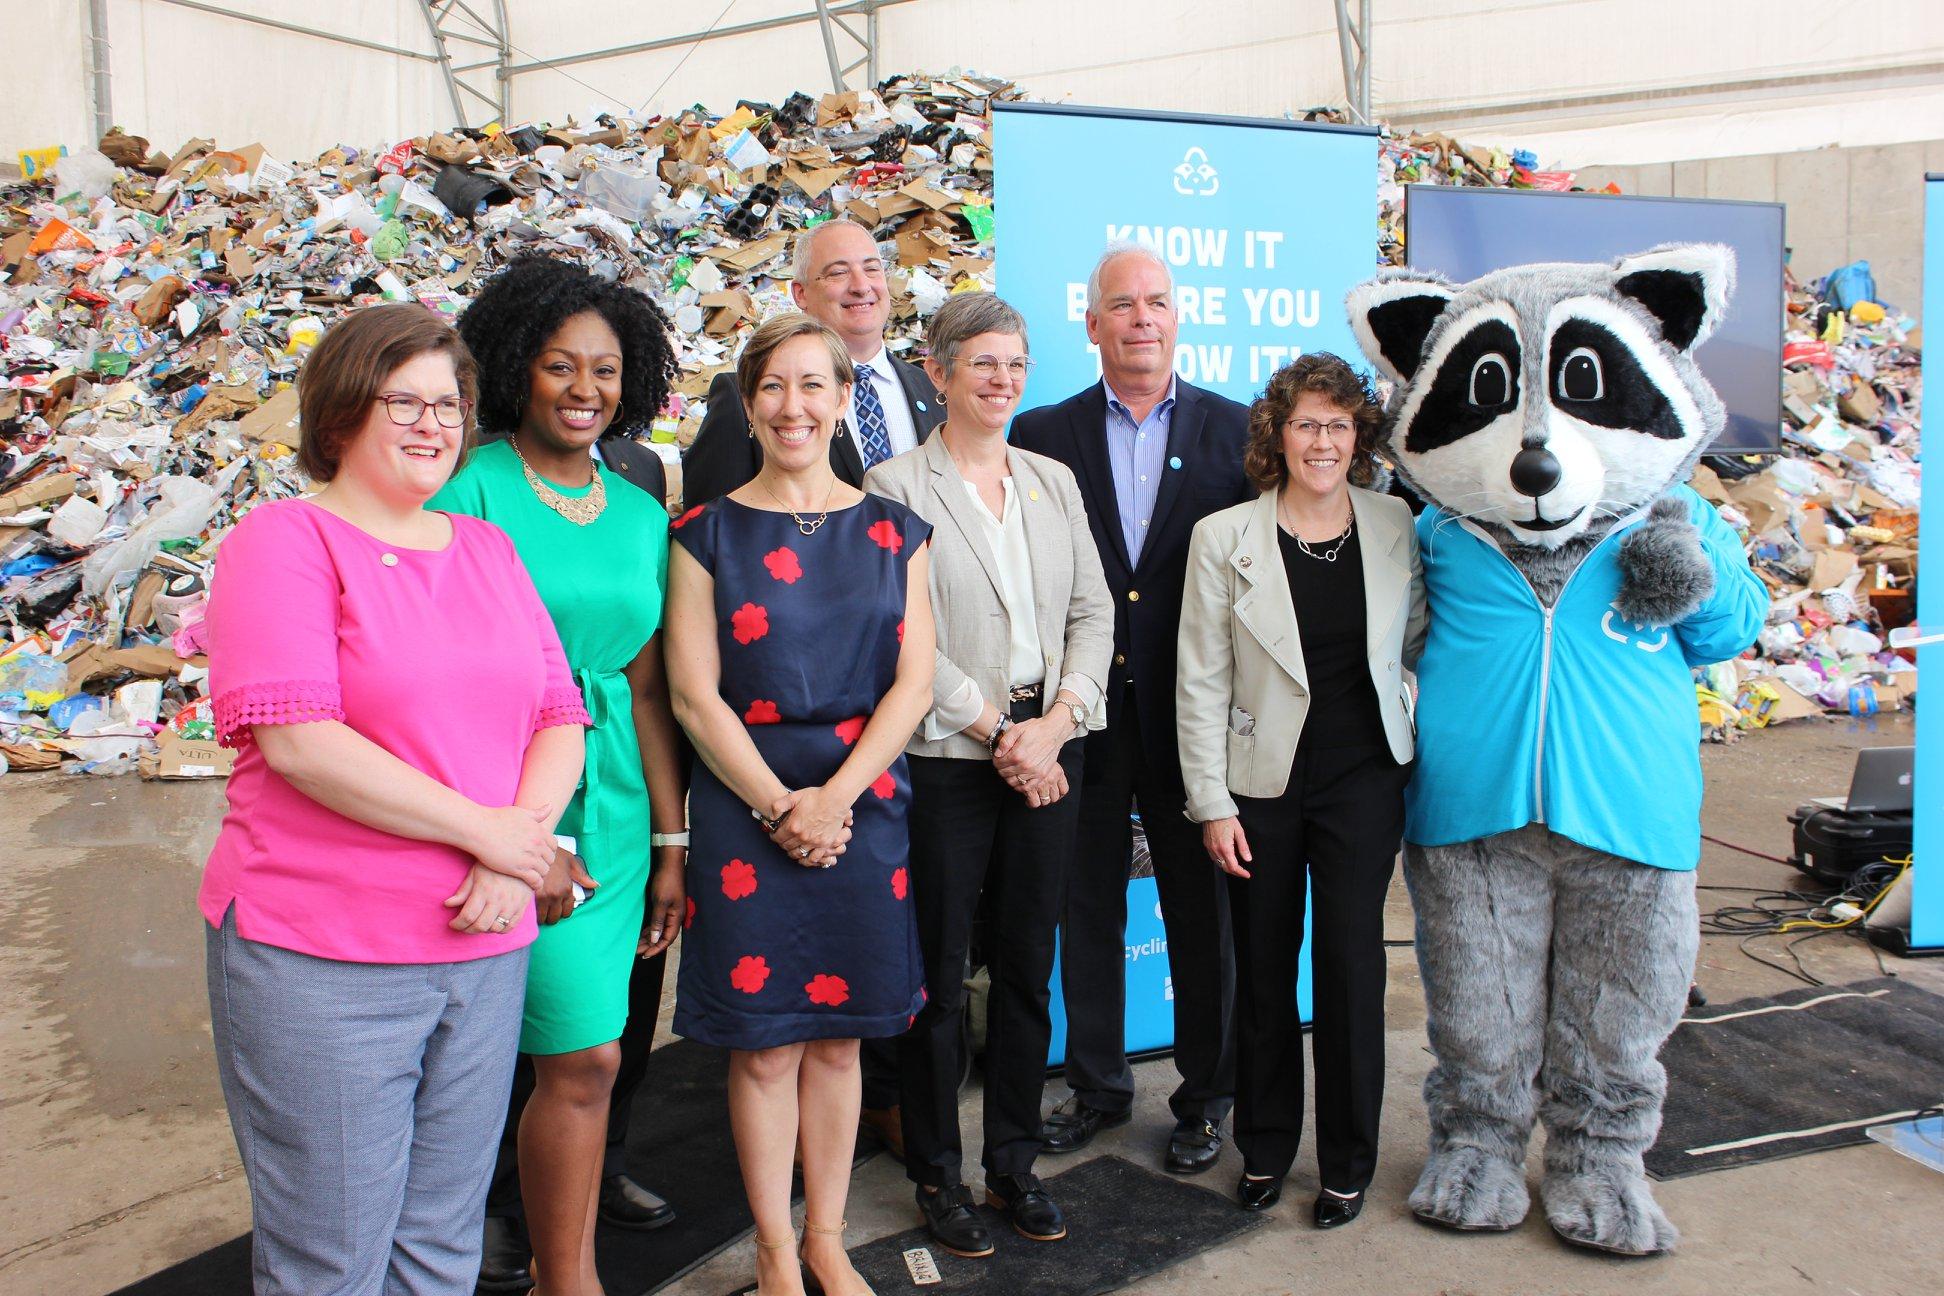 Members of EGLE with Raccoon Mascot